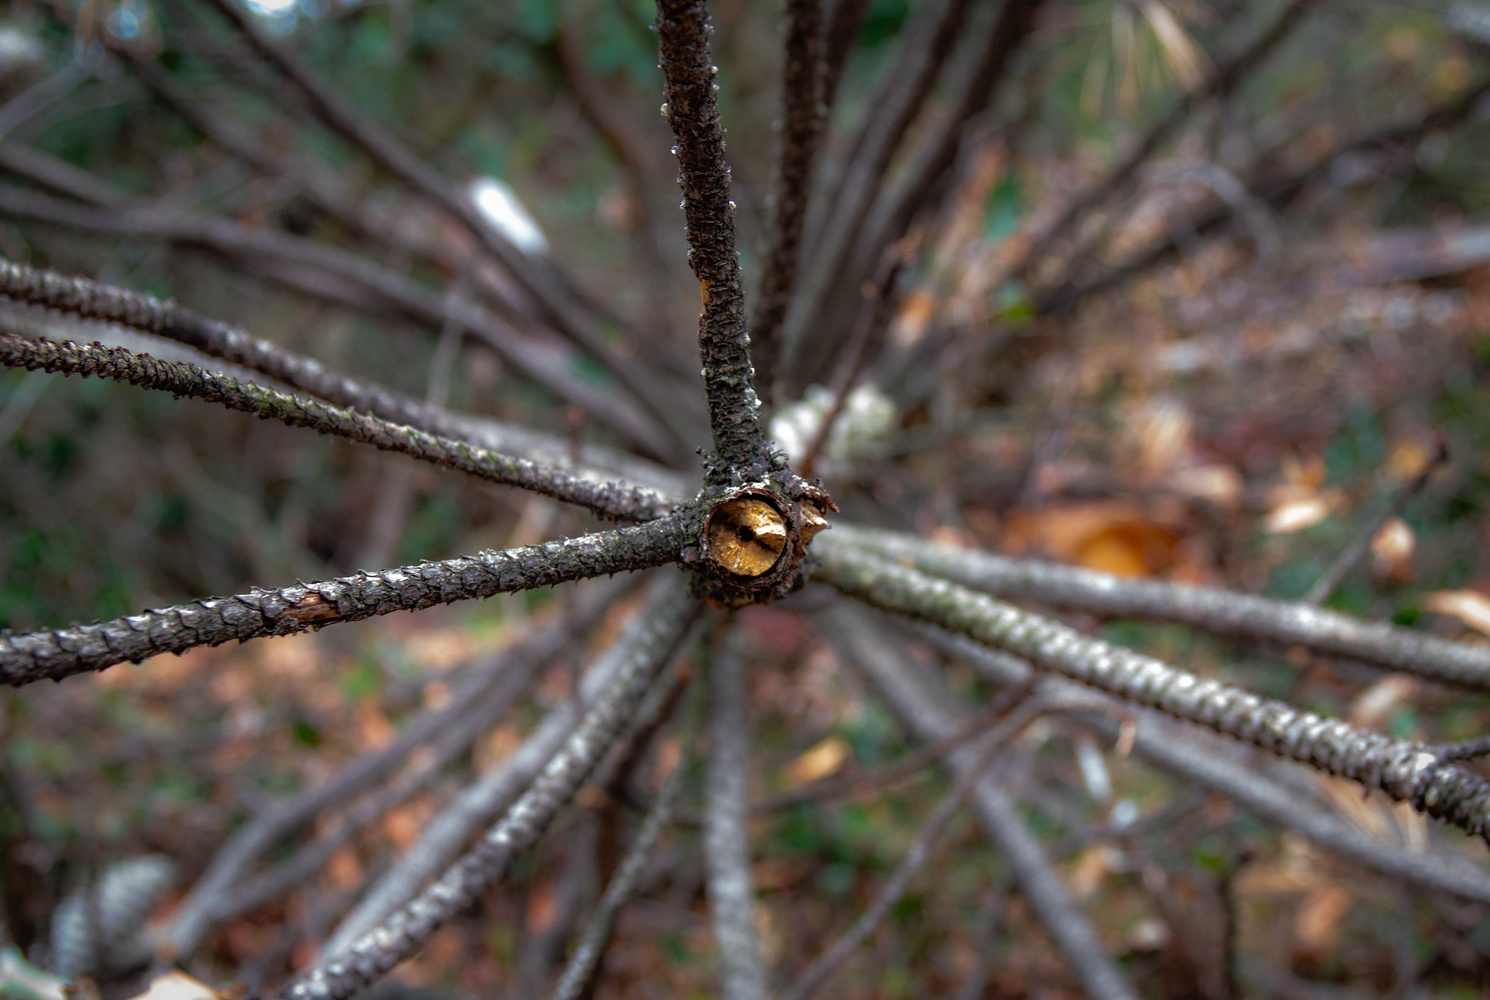 Nature Patterns by Daniel Boavida